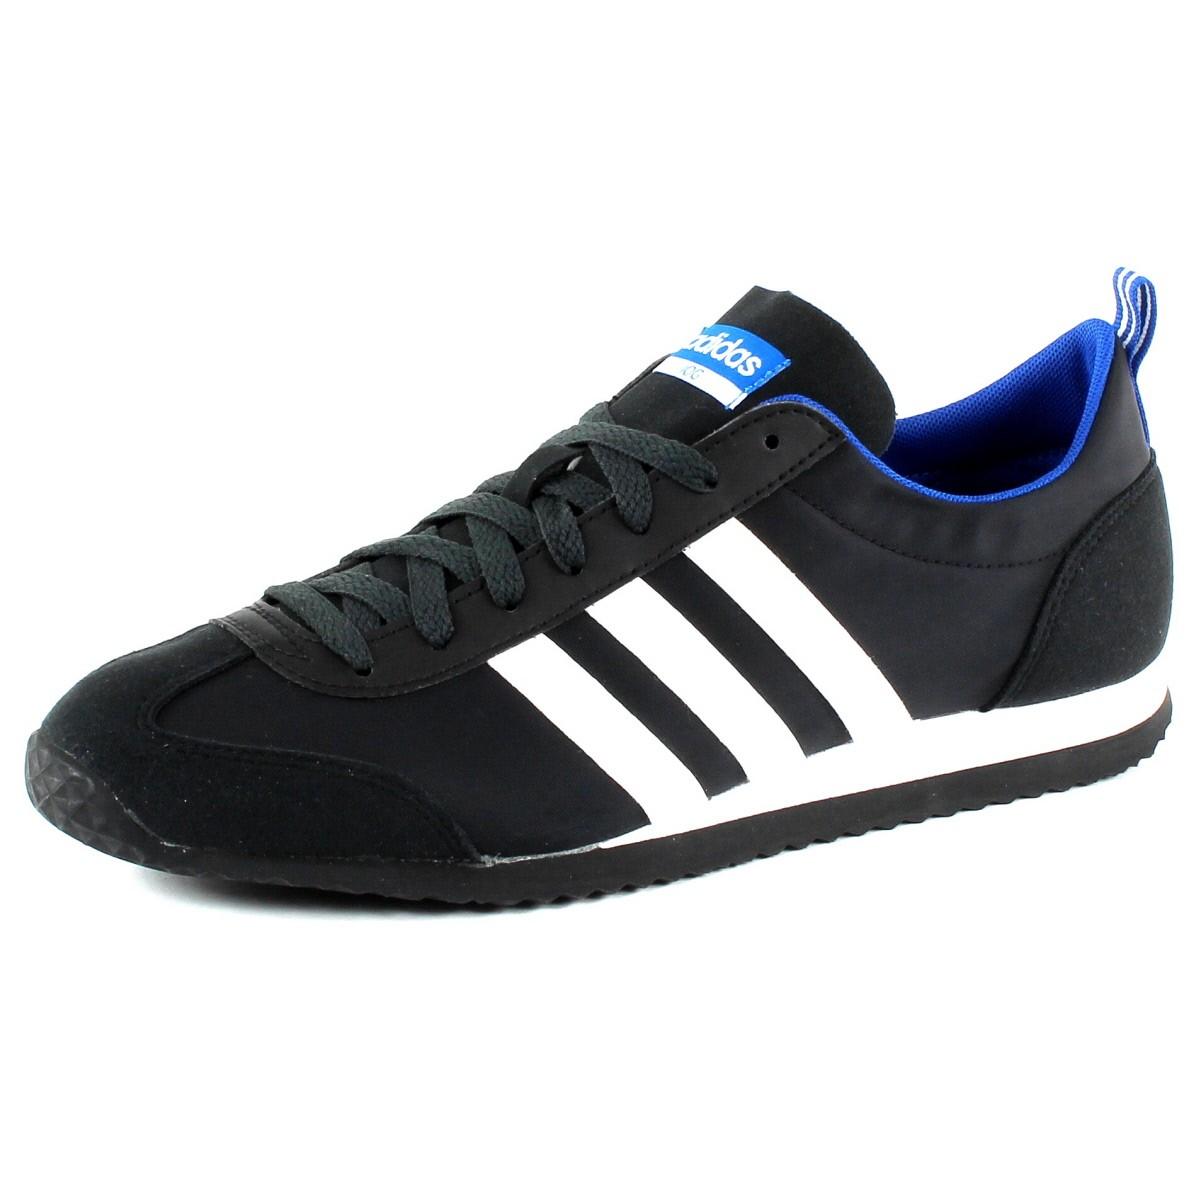 adidas neo - running shoe, VS JOG - Brands Expert